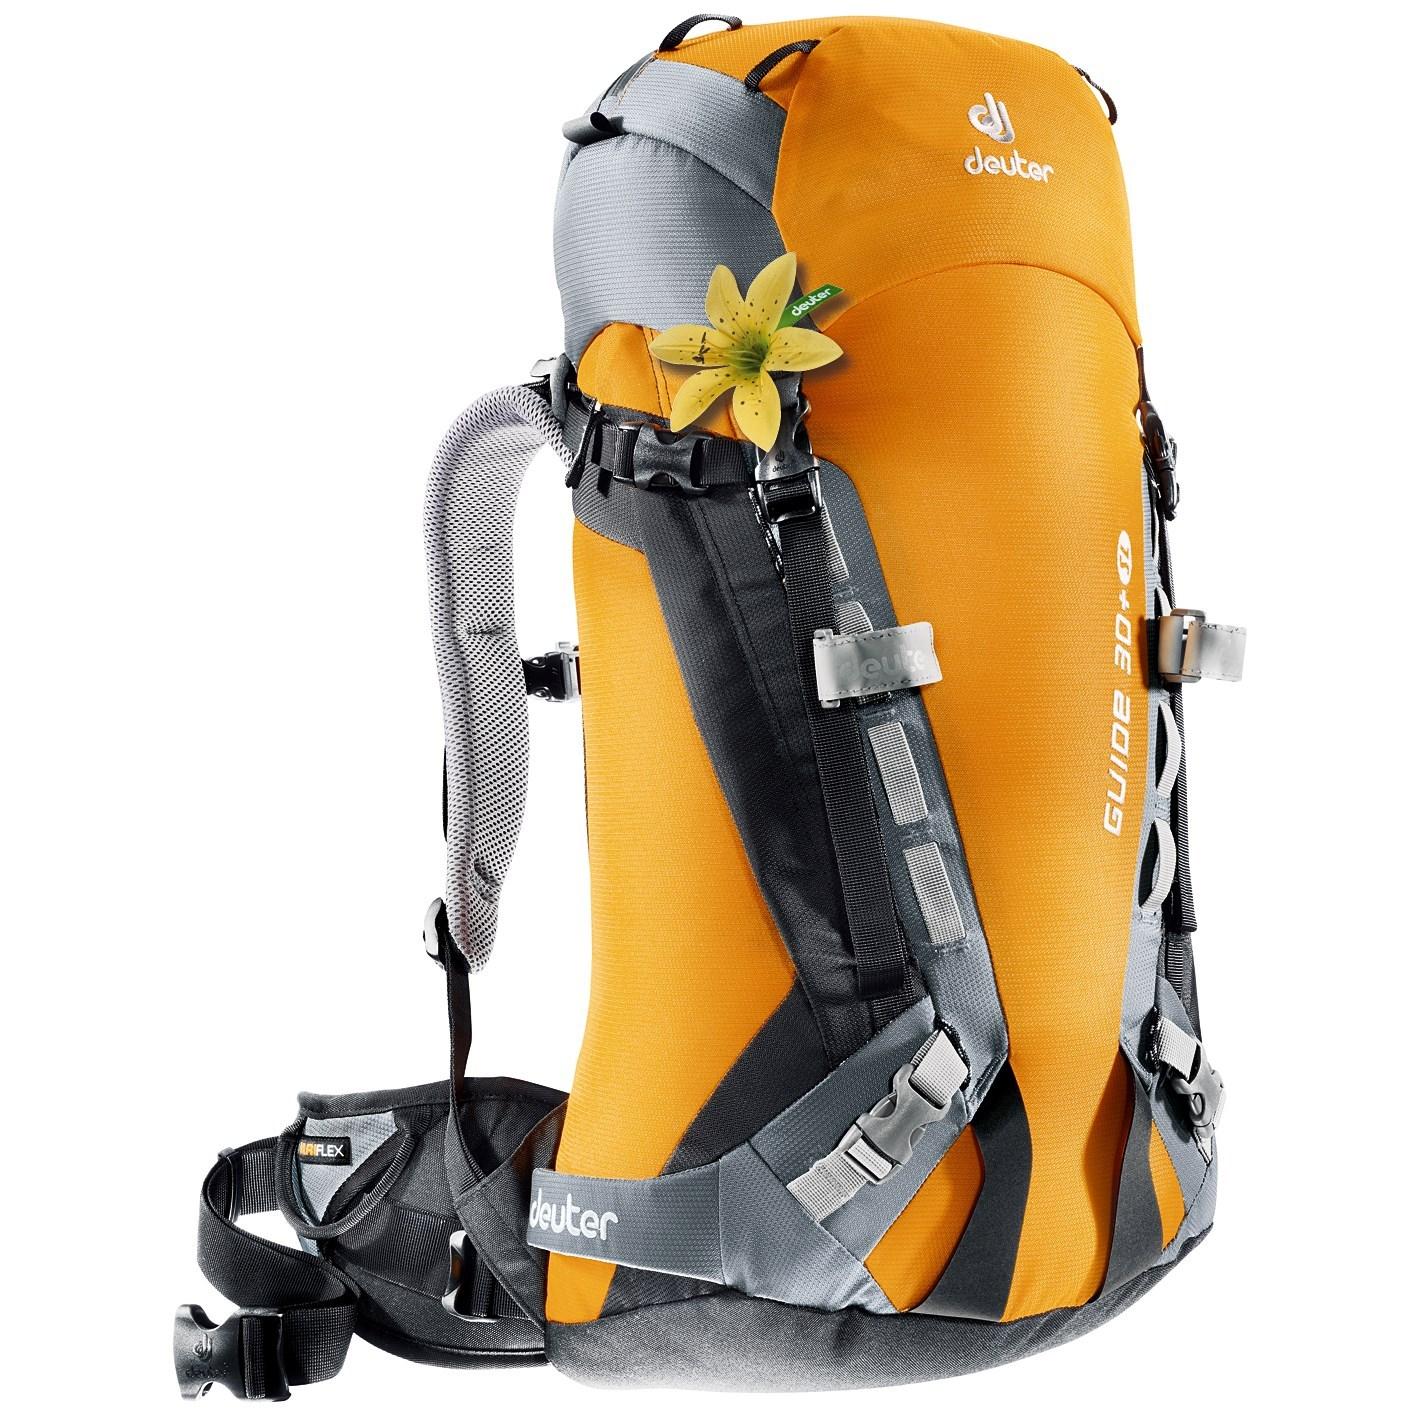 Deuter Guide 30 Sl Backpack For Women Save 69